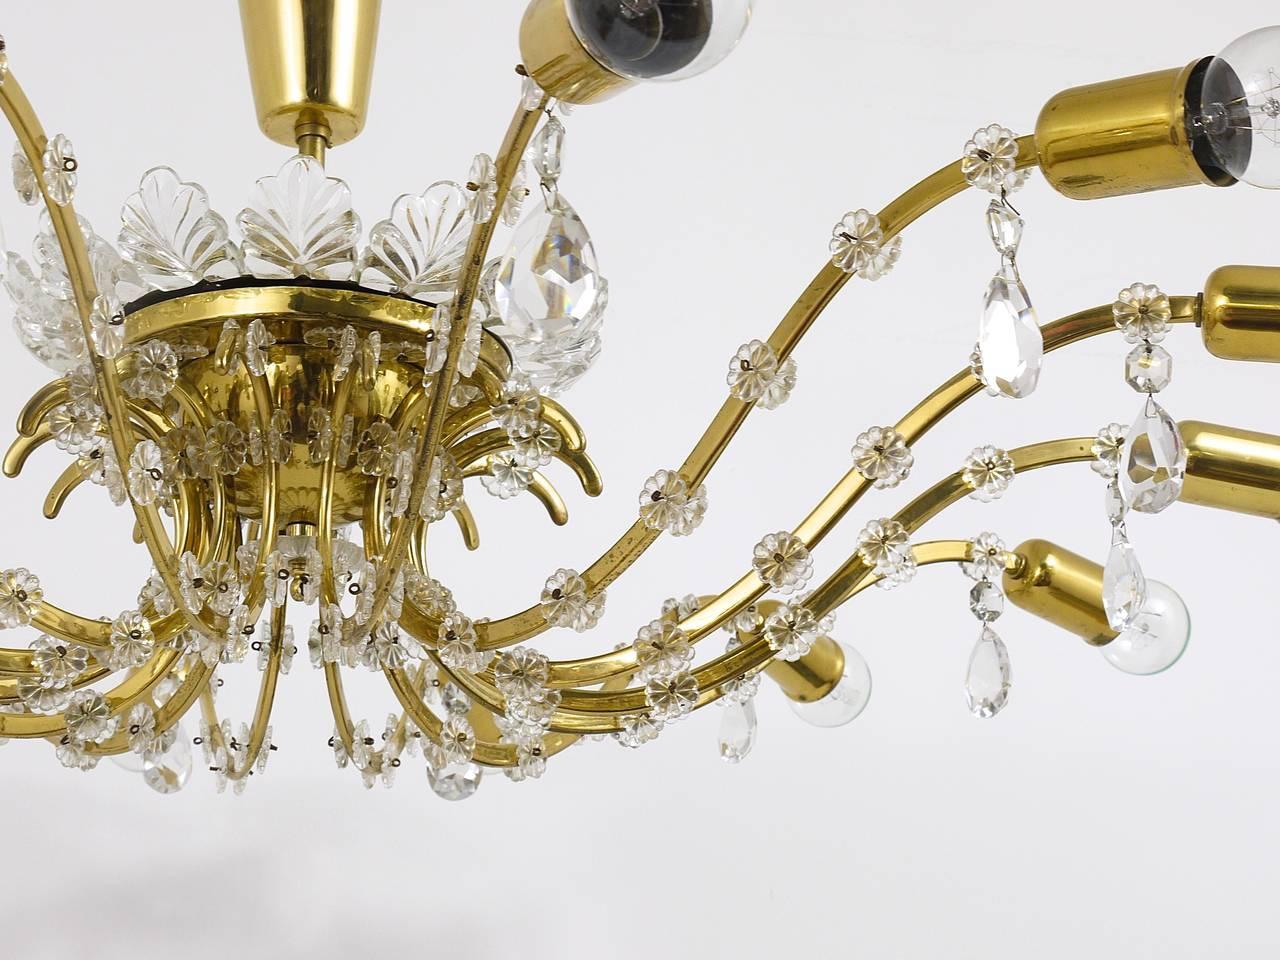 Austrian Huge Floral Lobmeyr Mid-Century Brass Crystal Chandelier, 1950s, Austria For Sale